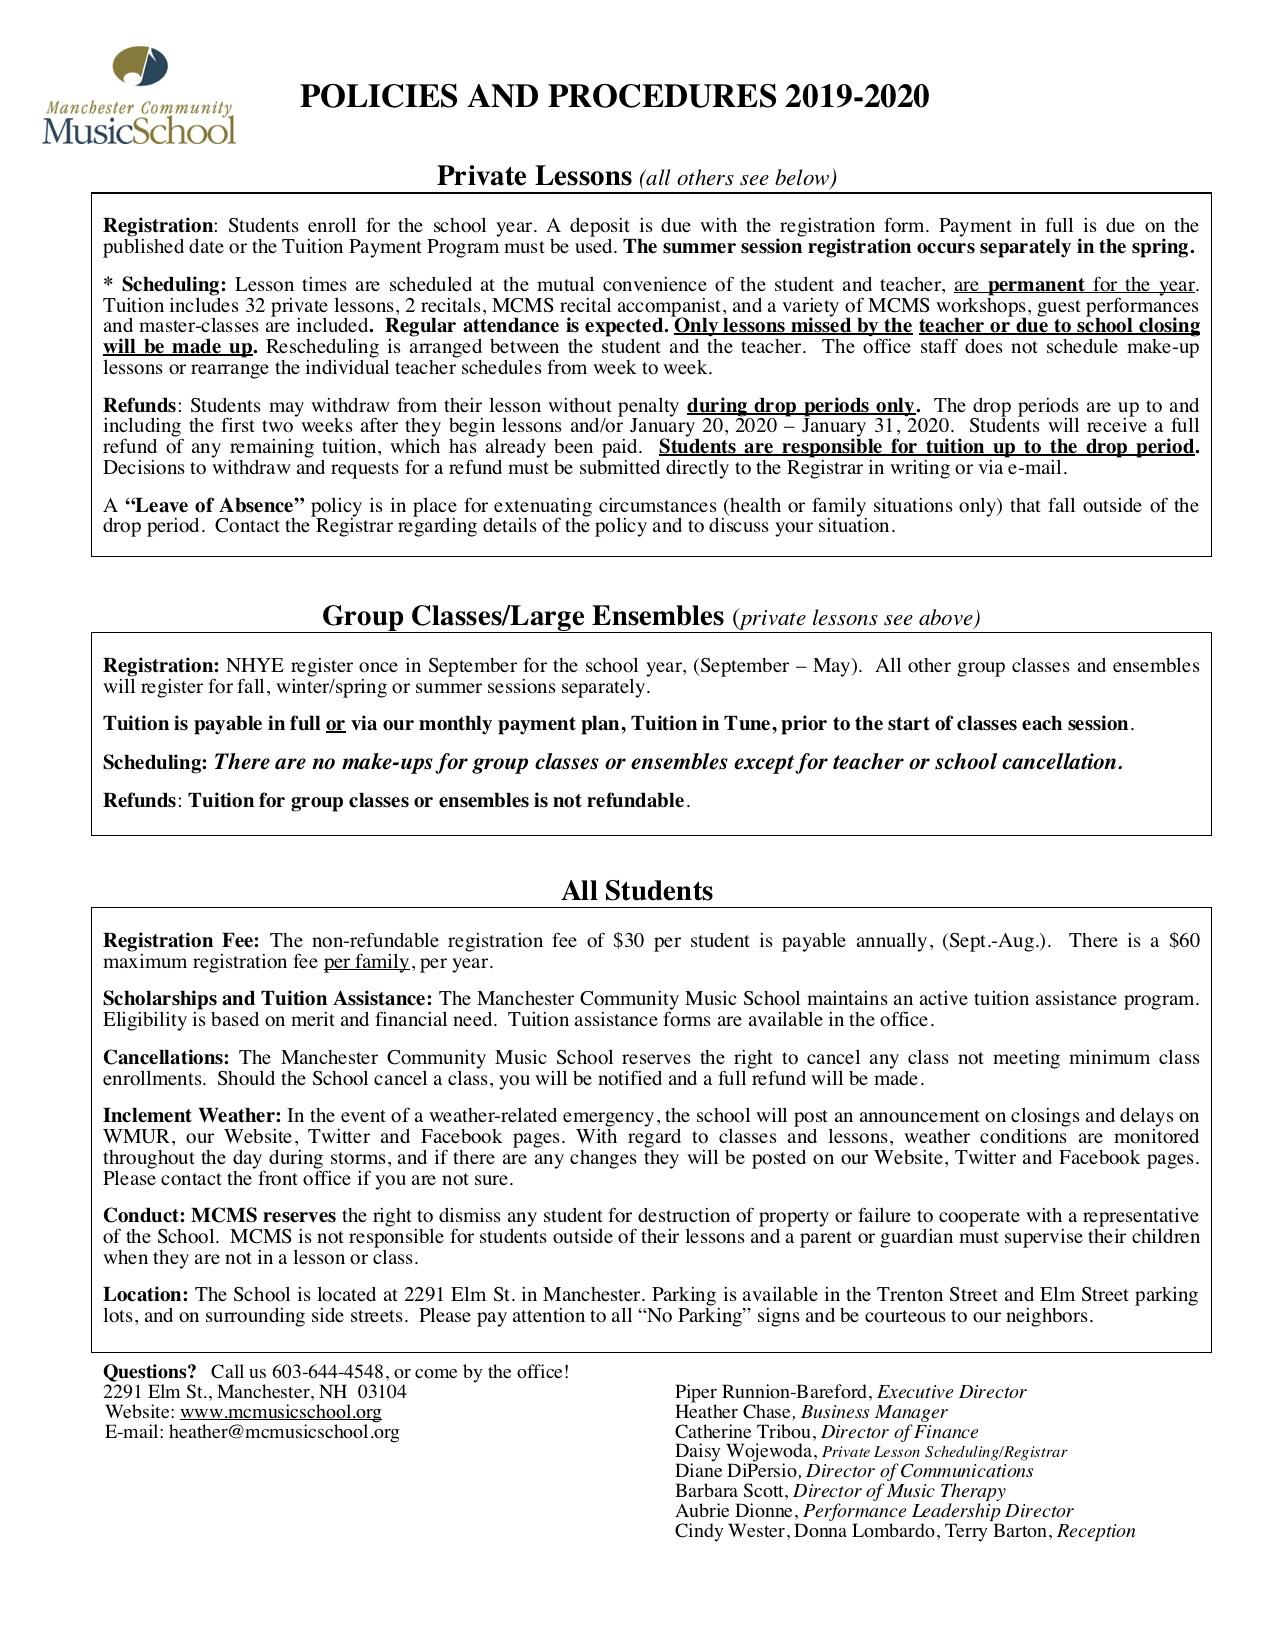 Manchester Community Music School | Policies & Procedures